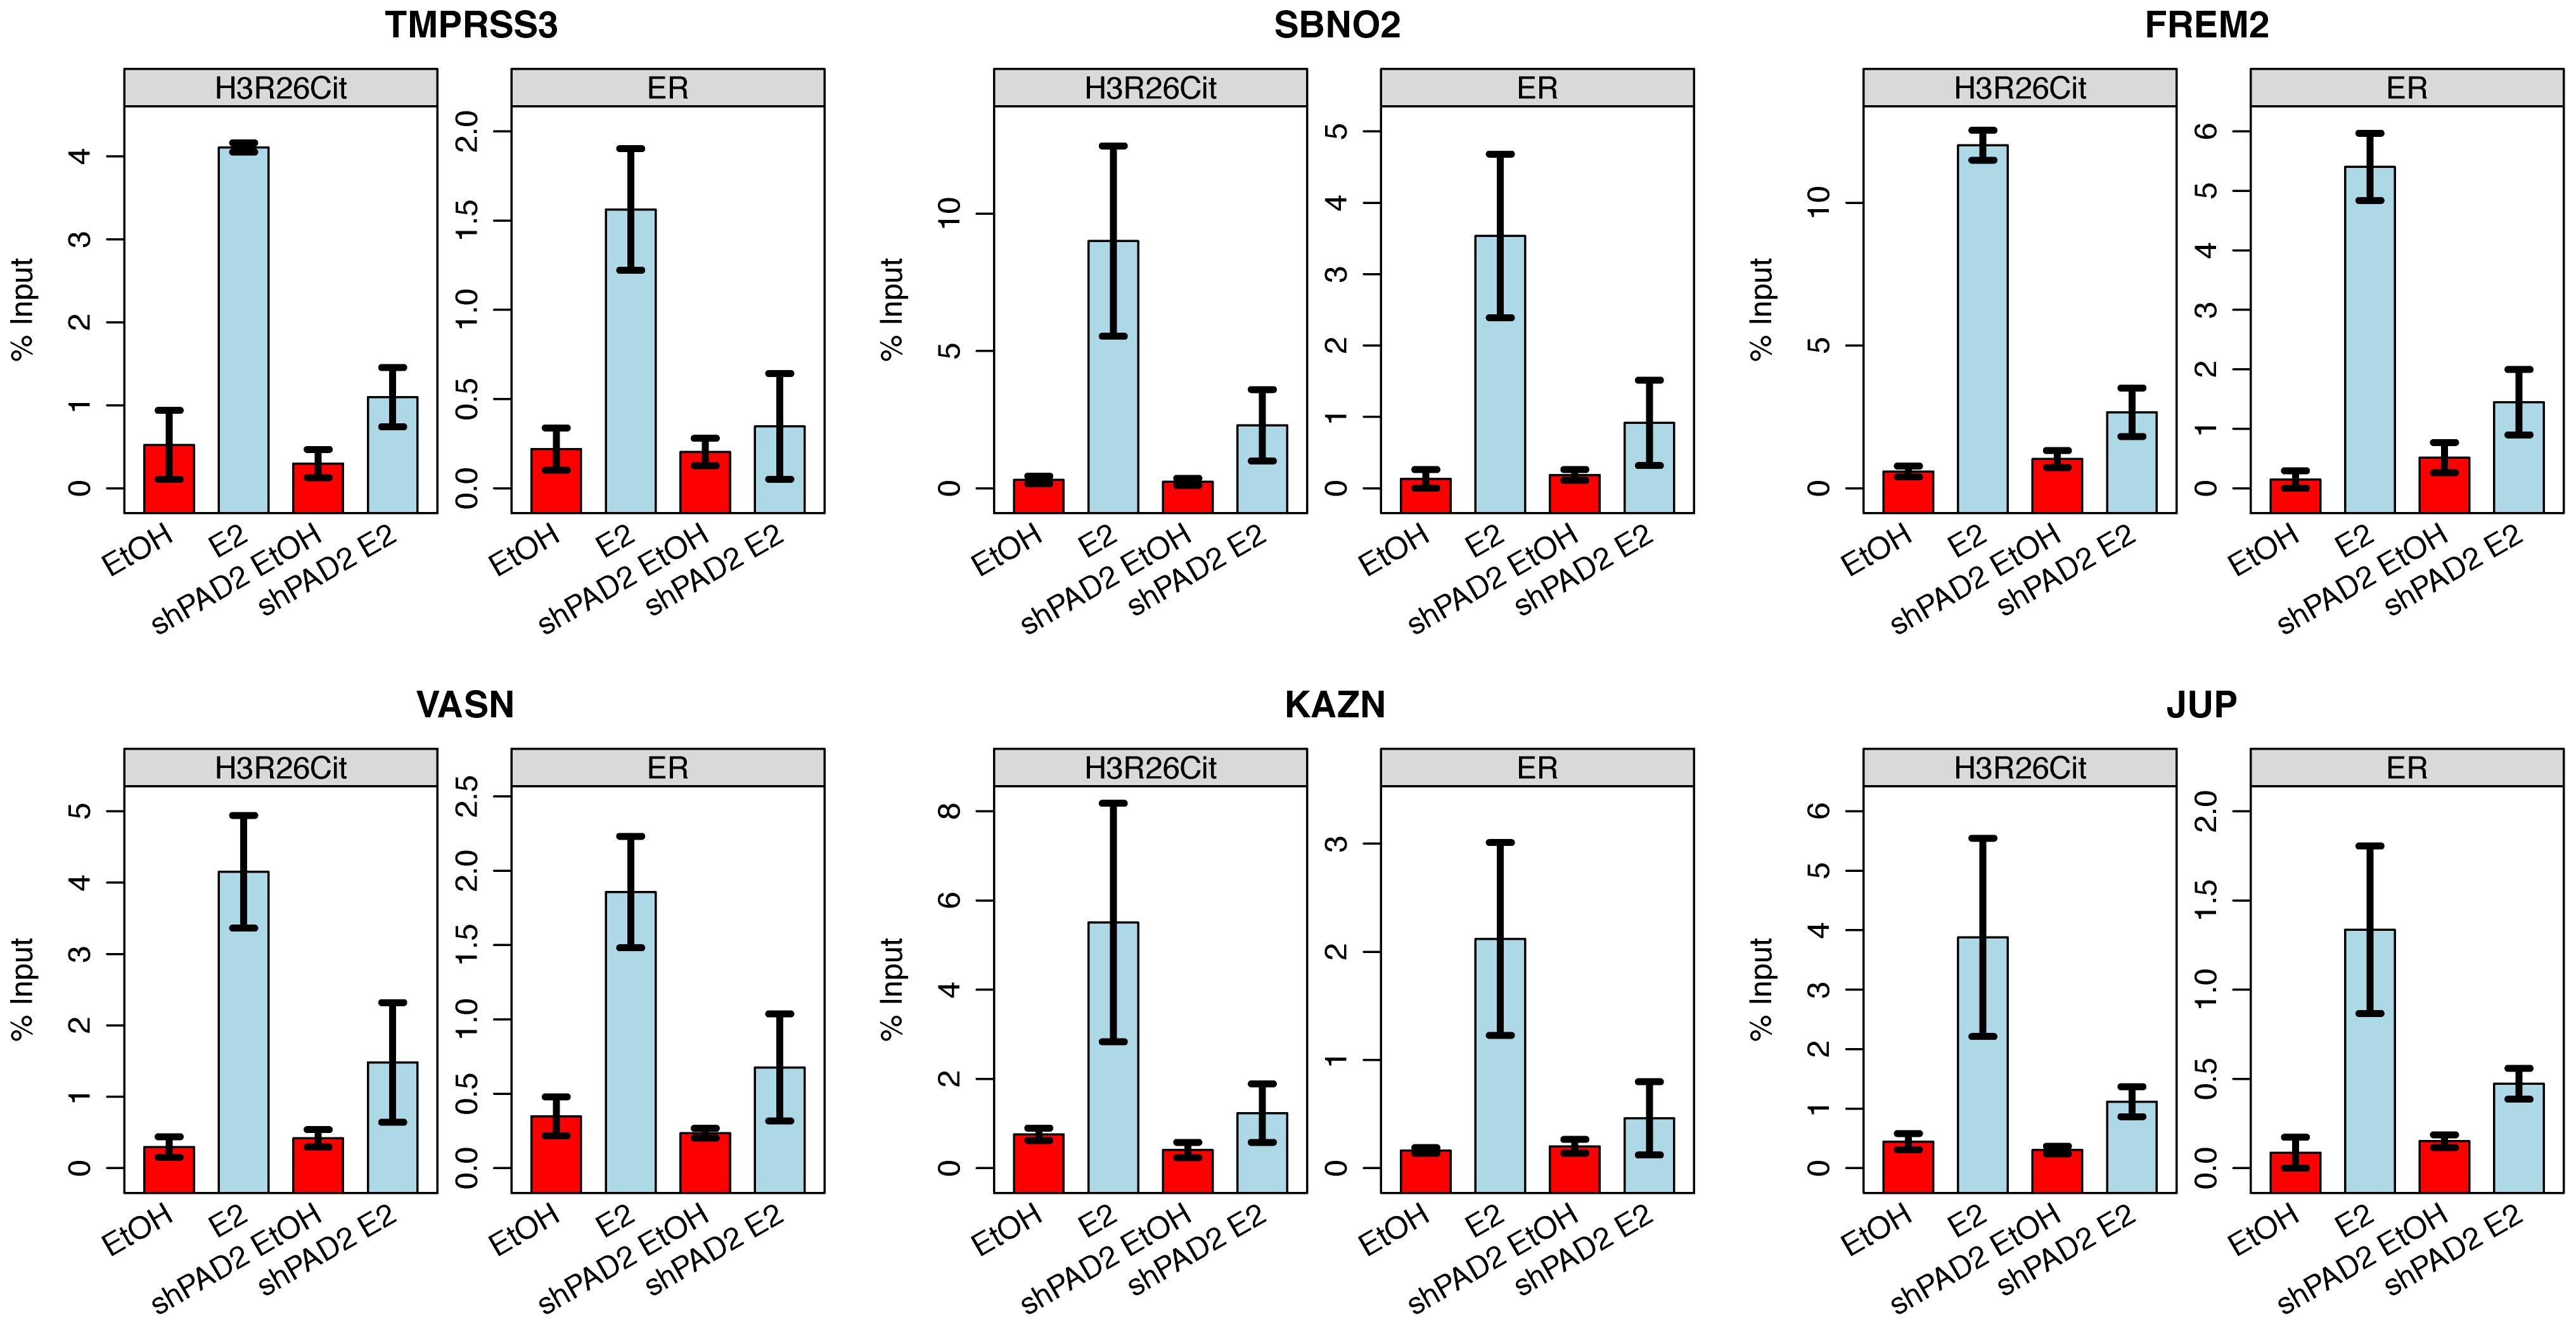 PAD2 depletion abrogates deimination of H3R26 and ER binding.